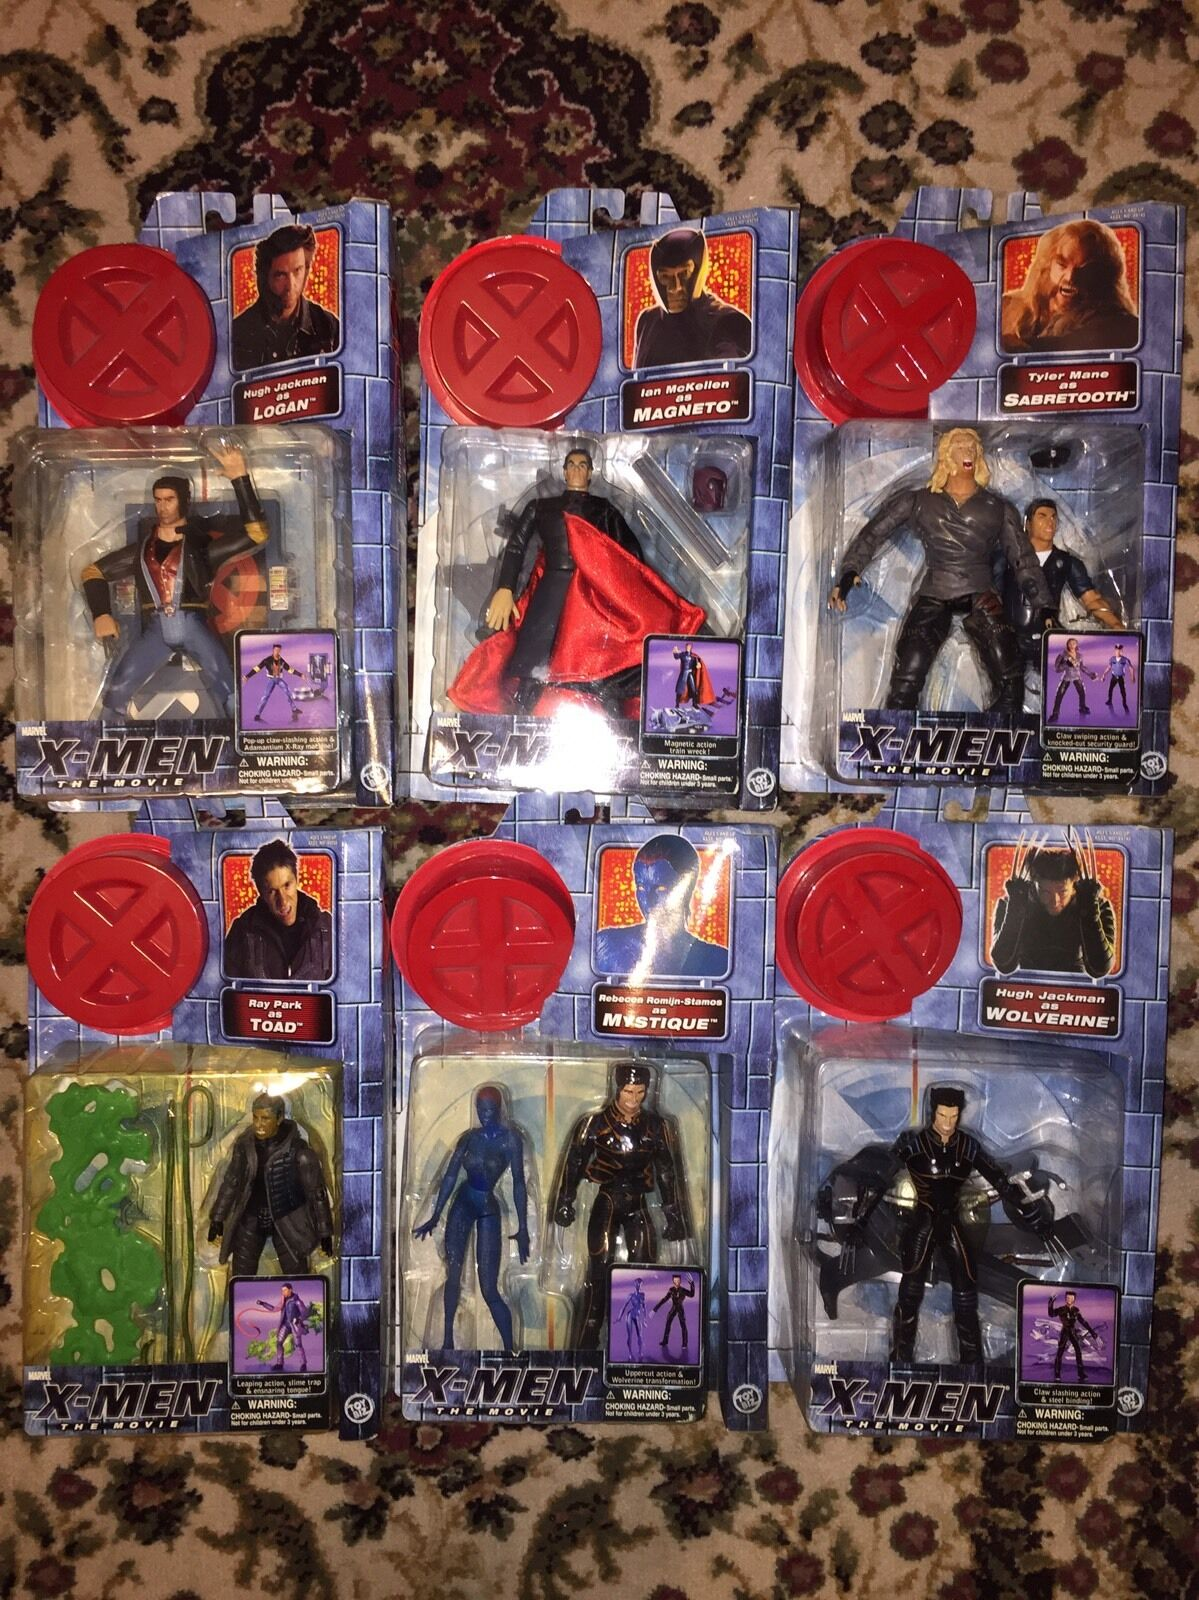 Lot of 6 X-Men Movie ToyBiz Action Figures (Adult Collector) NIB Mint